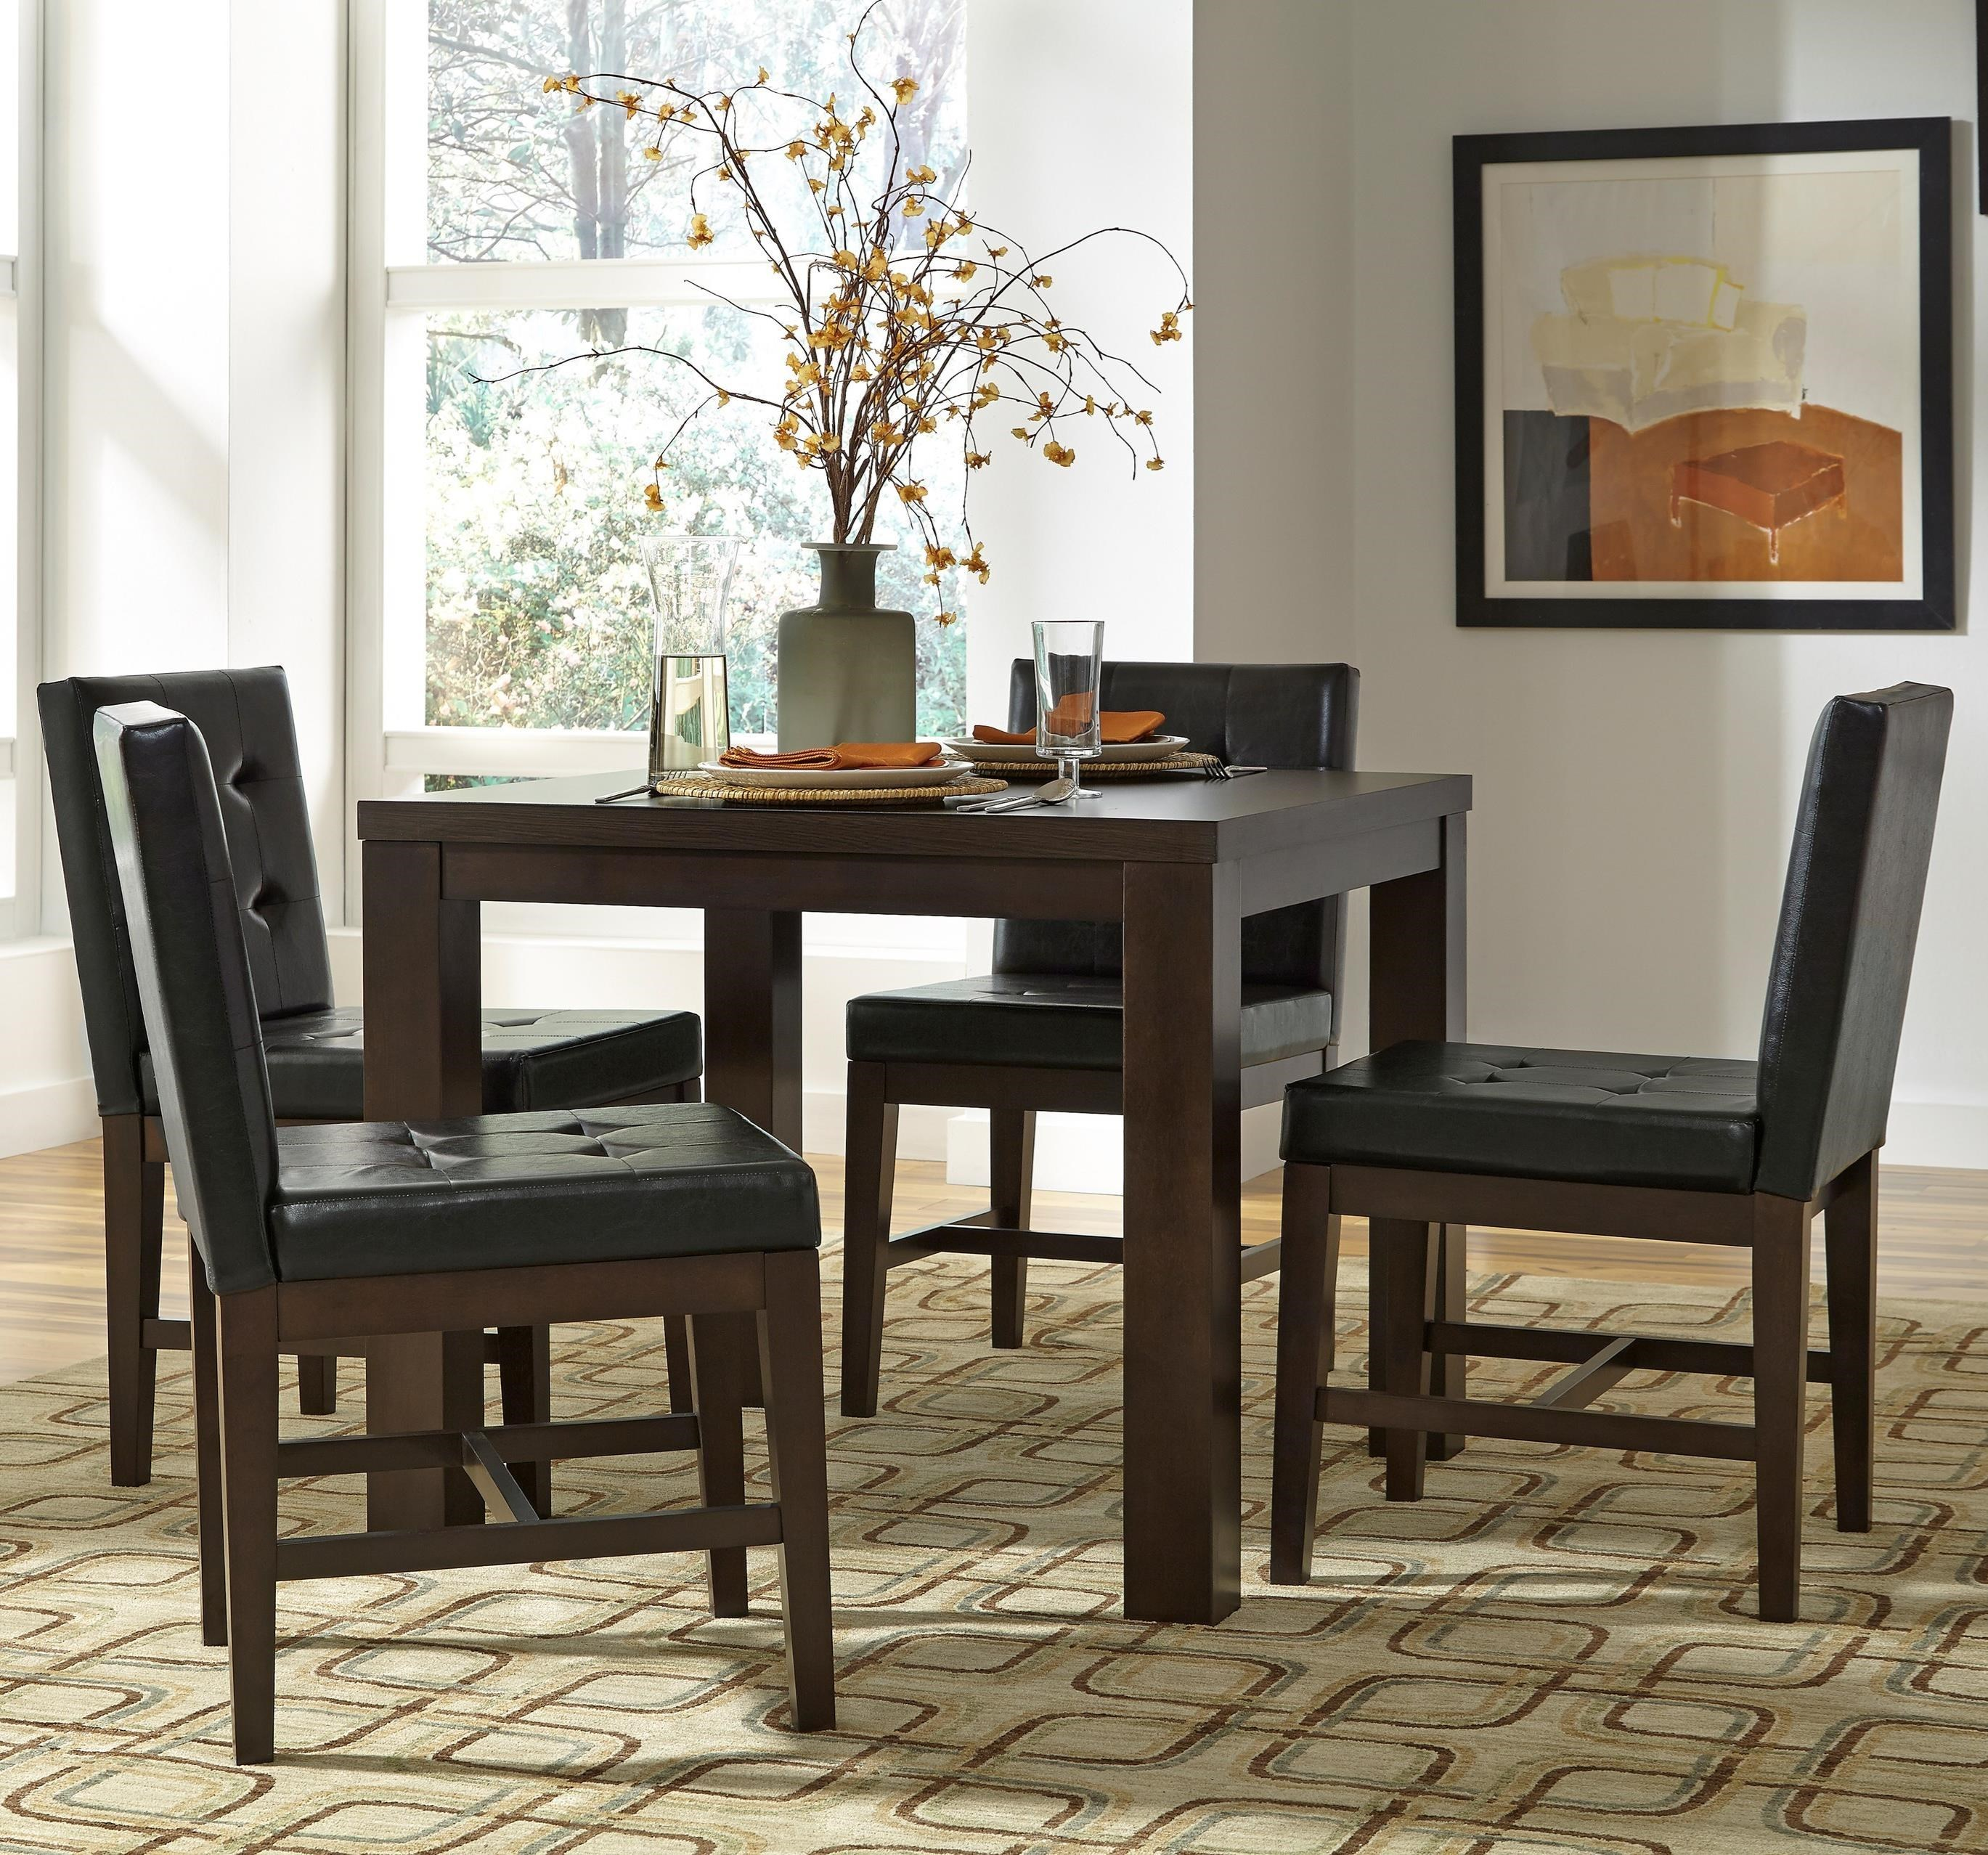 Progressive Furniture Athena 5 Piece Square Dining Table Set